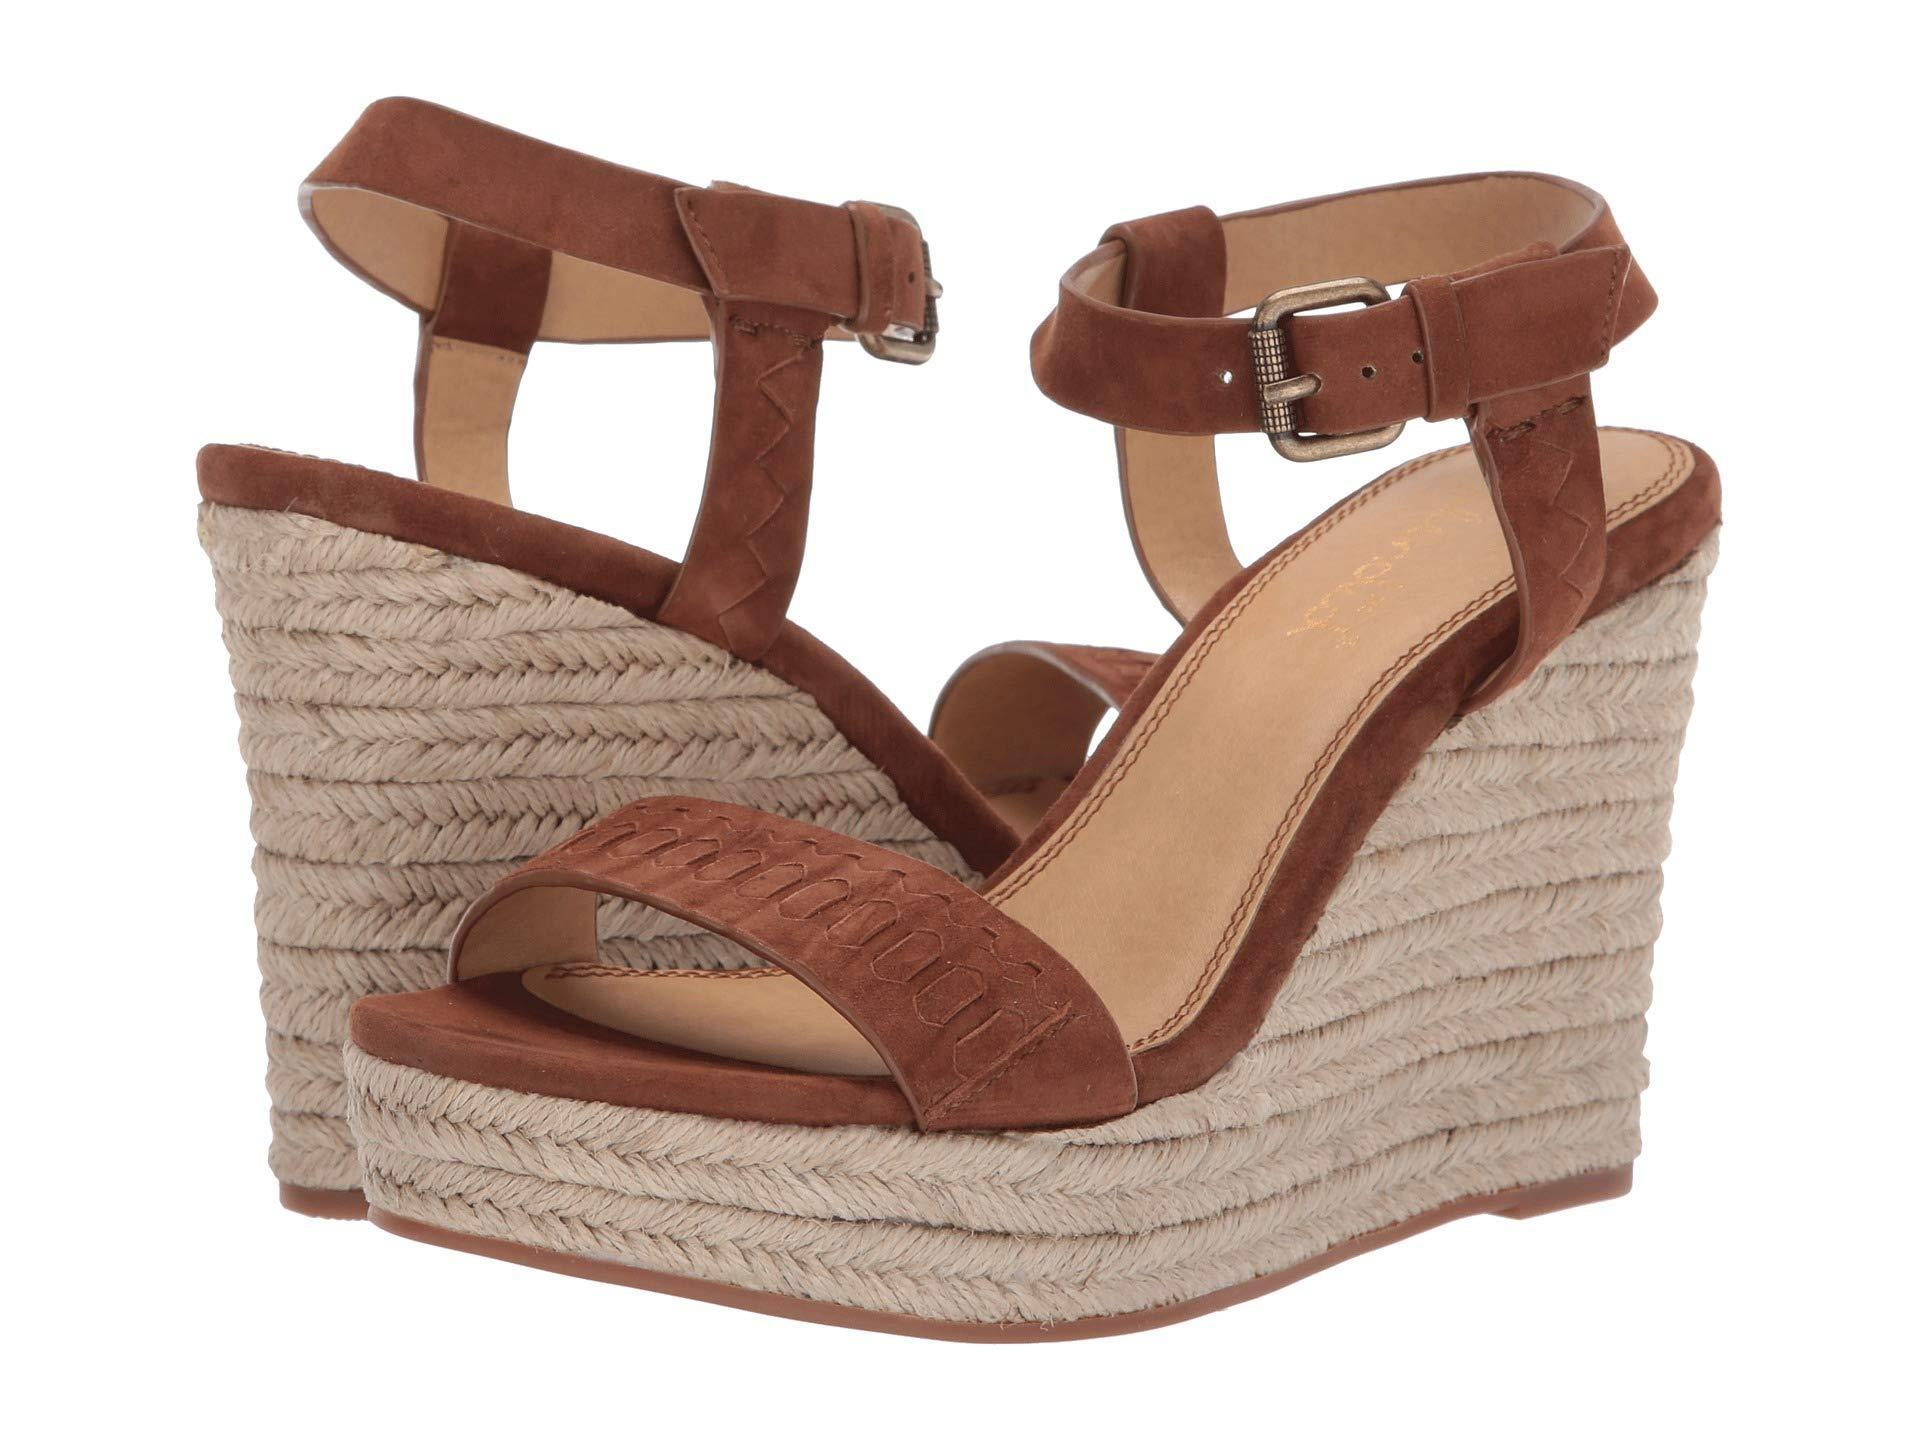 ff0b389692b Lyst - Splendid Shayla (chestnut Kid Suede) Women s Wedge Shoes in Brown